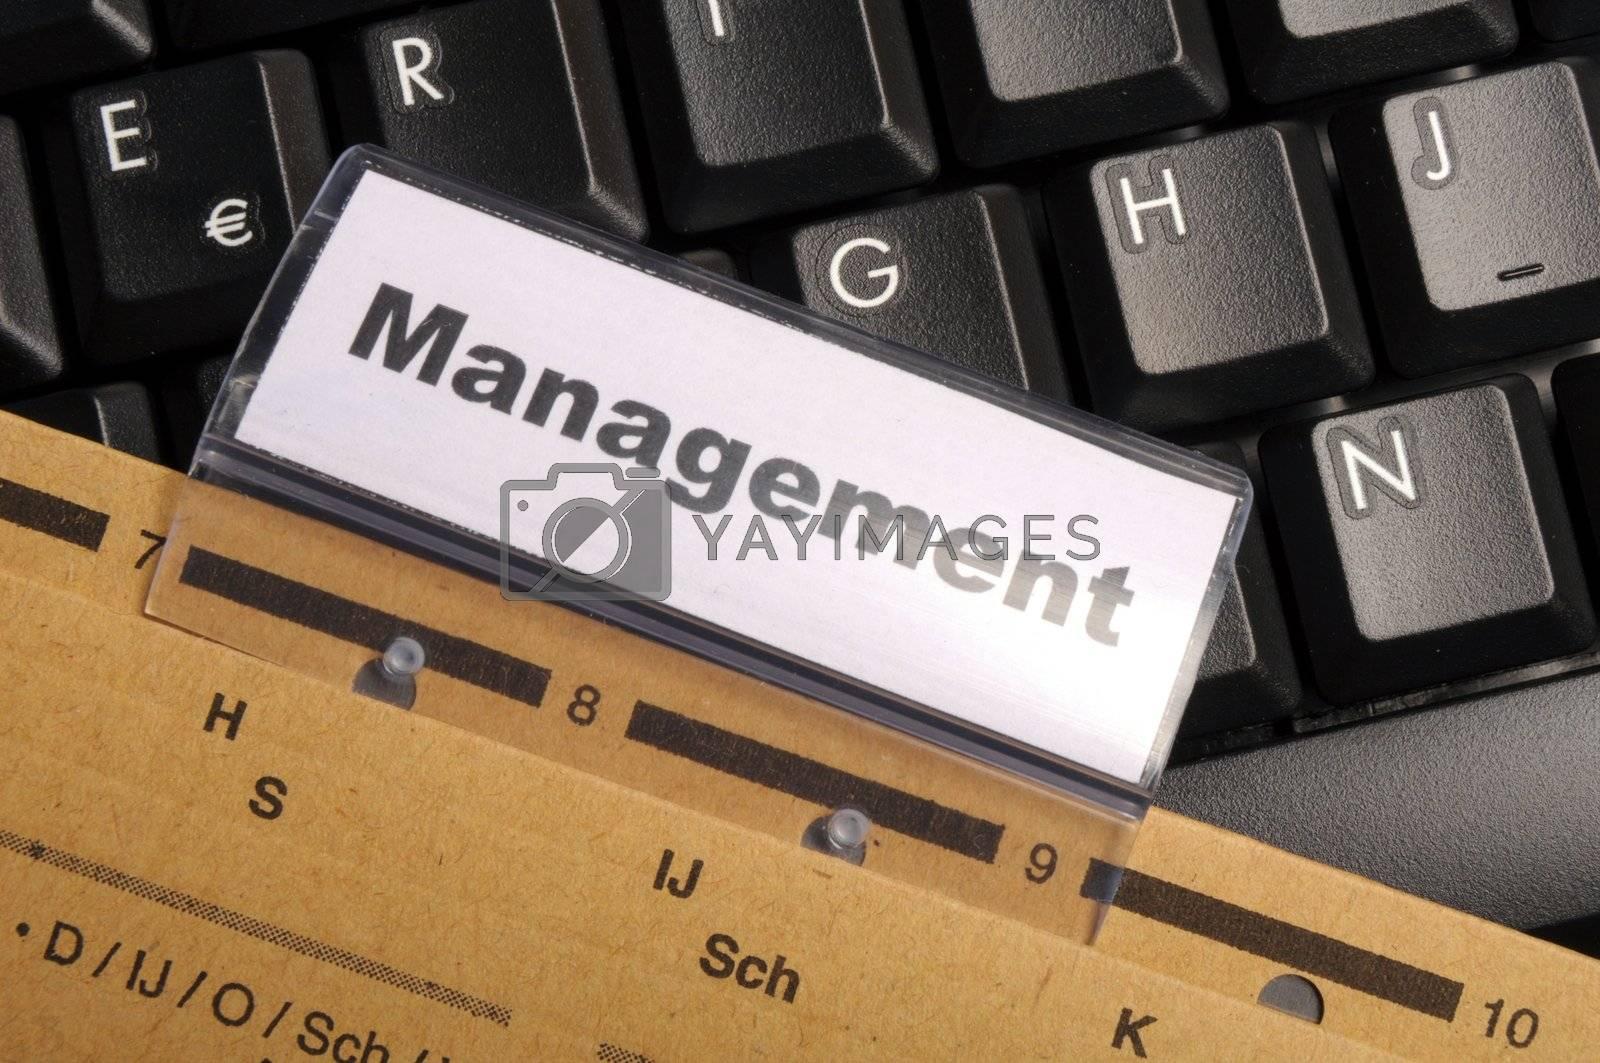 management by gunnar3000